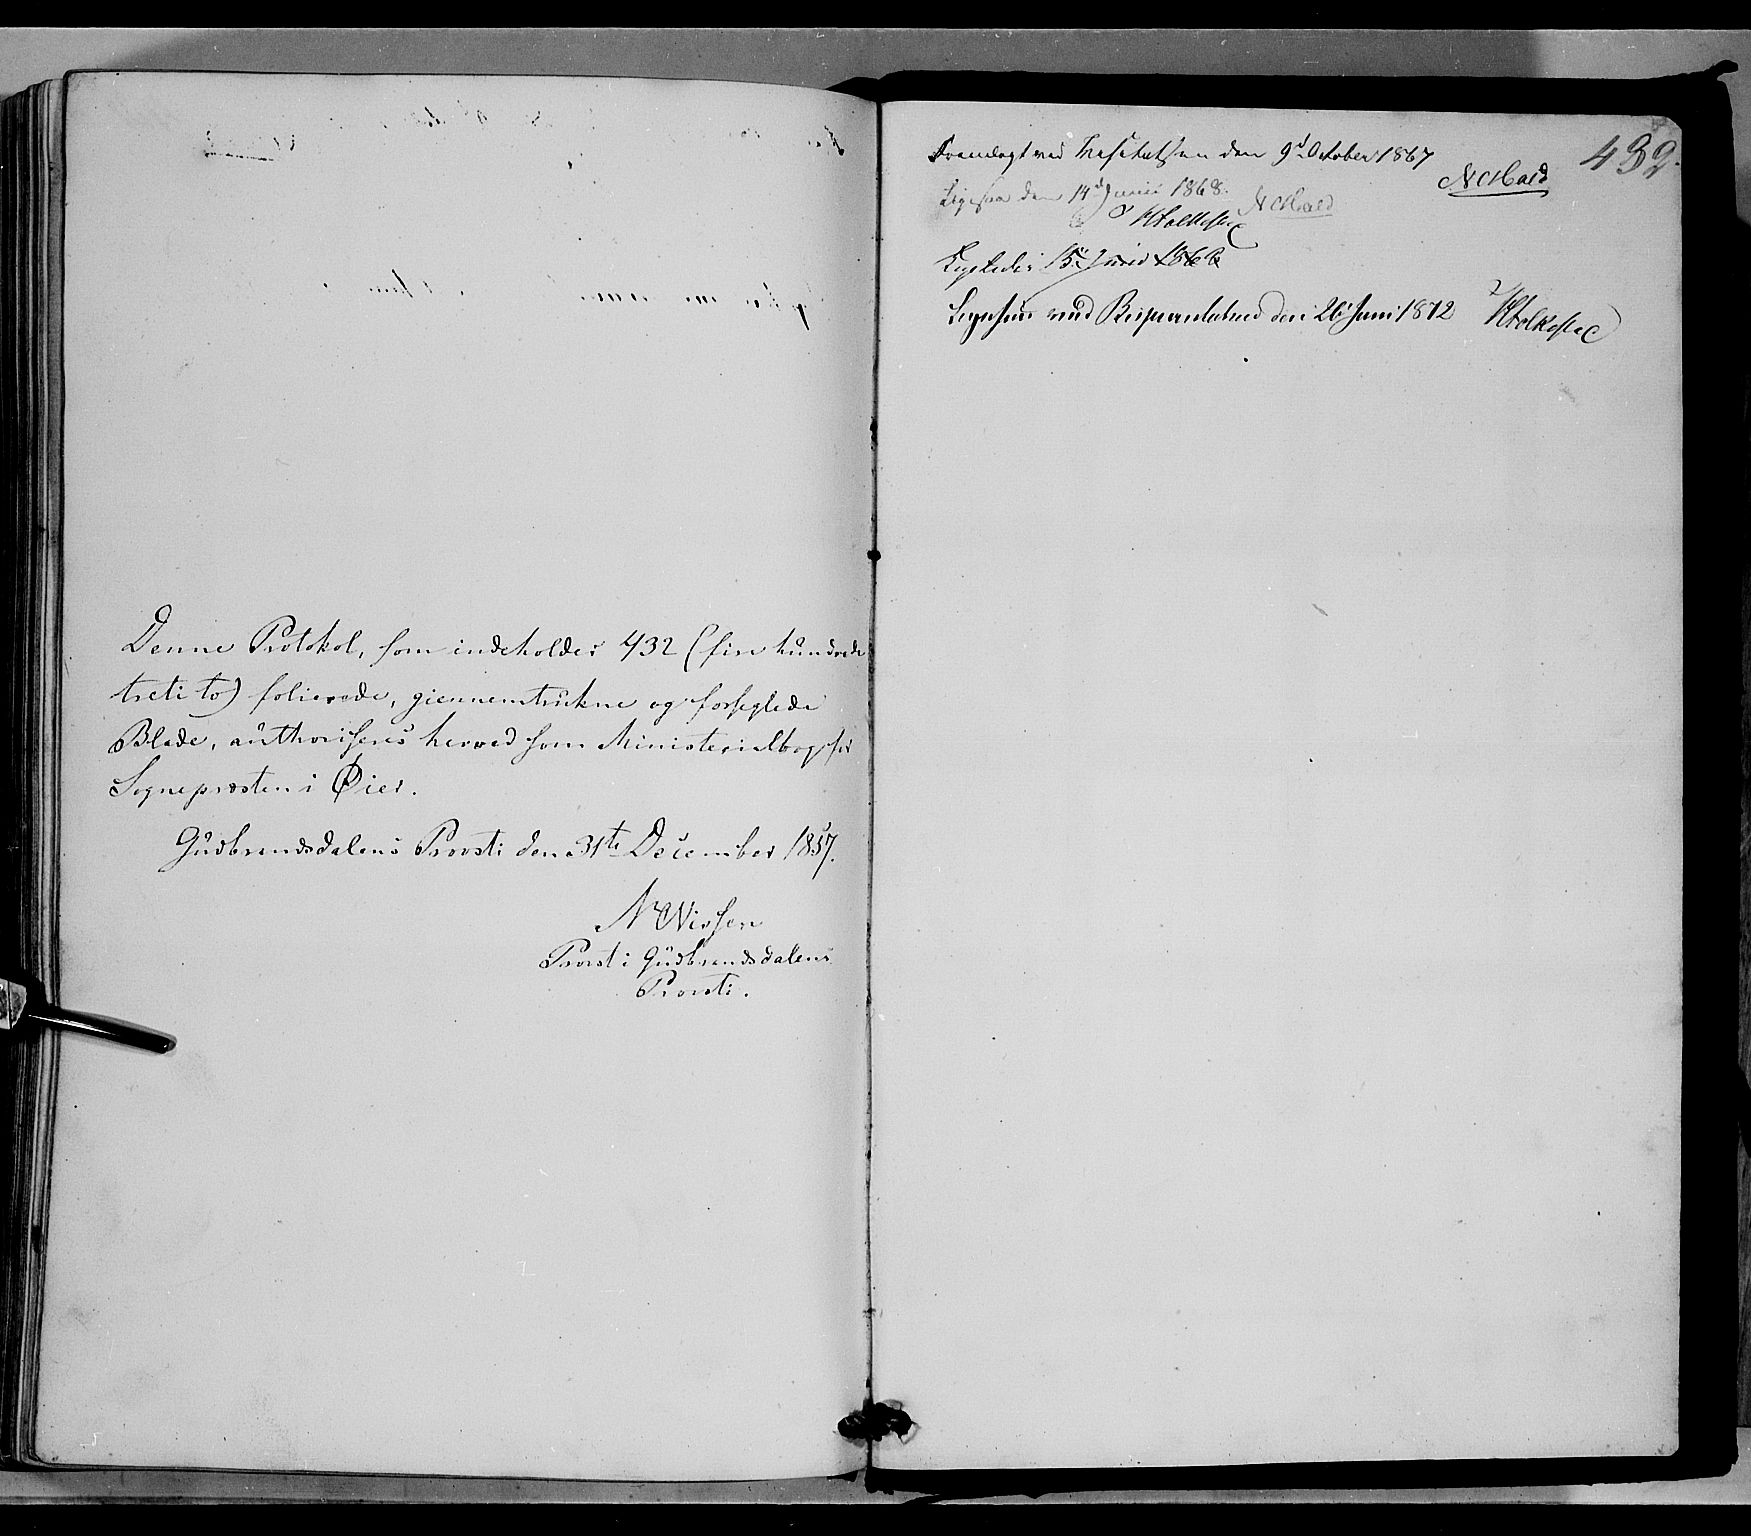 SAH, Øyer prestekontor, Ministerialbok nr. 6, 1858-1874, s. 432